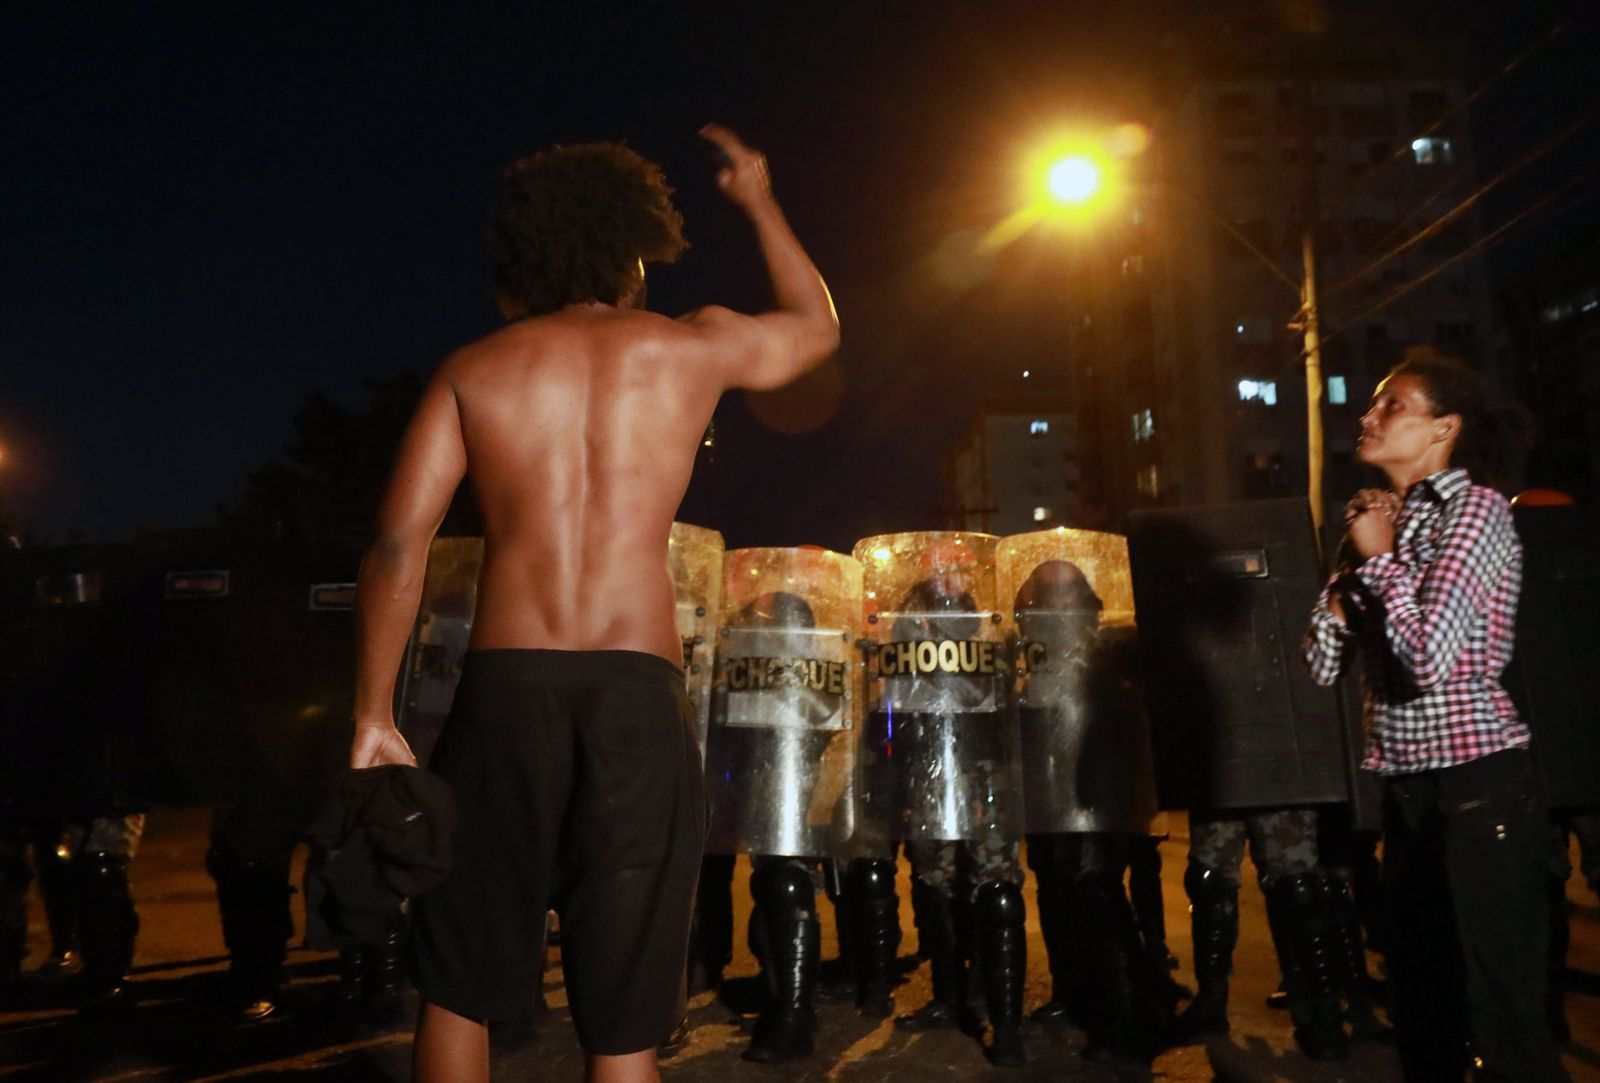 TOPSHOT-BRAZIL-RACISM-CRIME-PROTEST